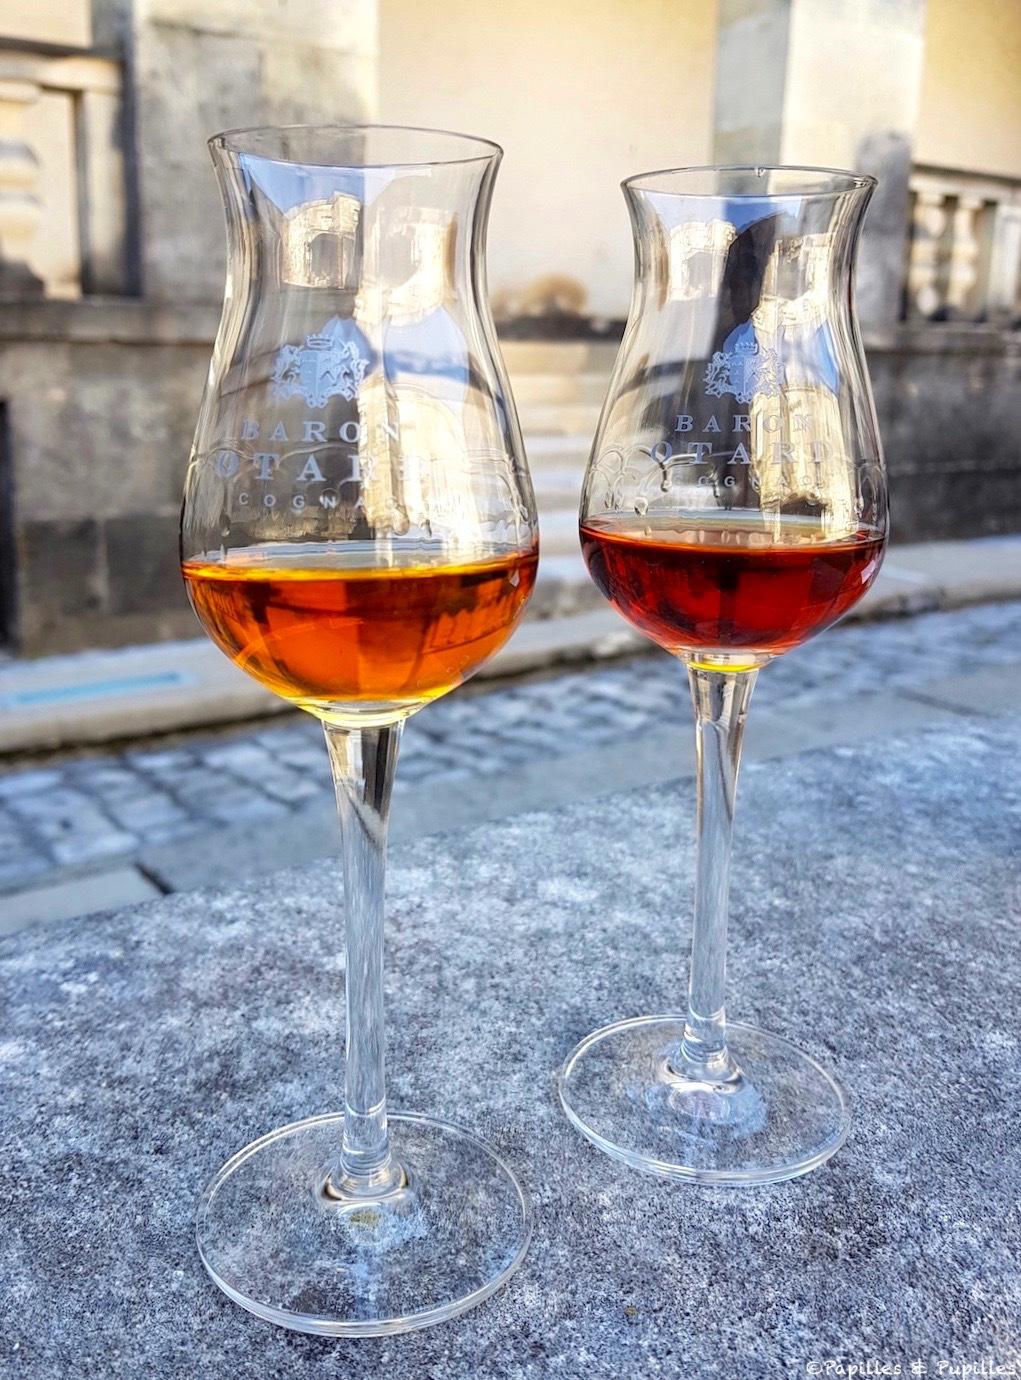 Cognac - Baron Otard